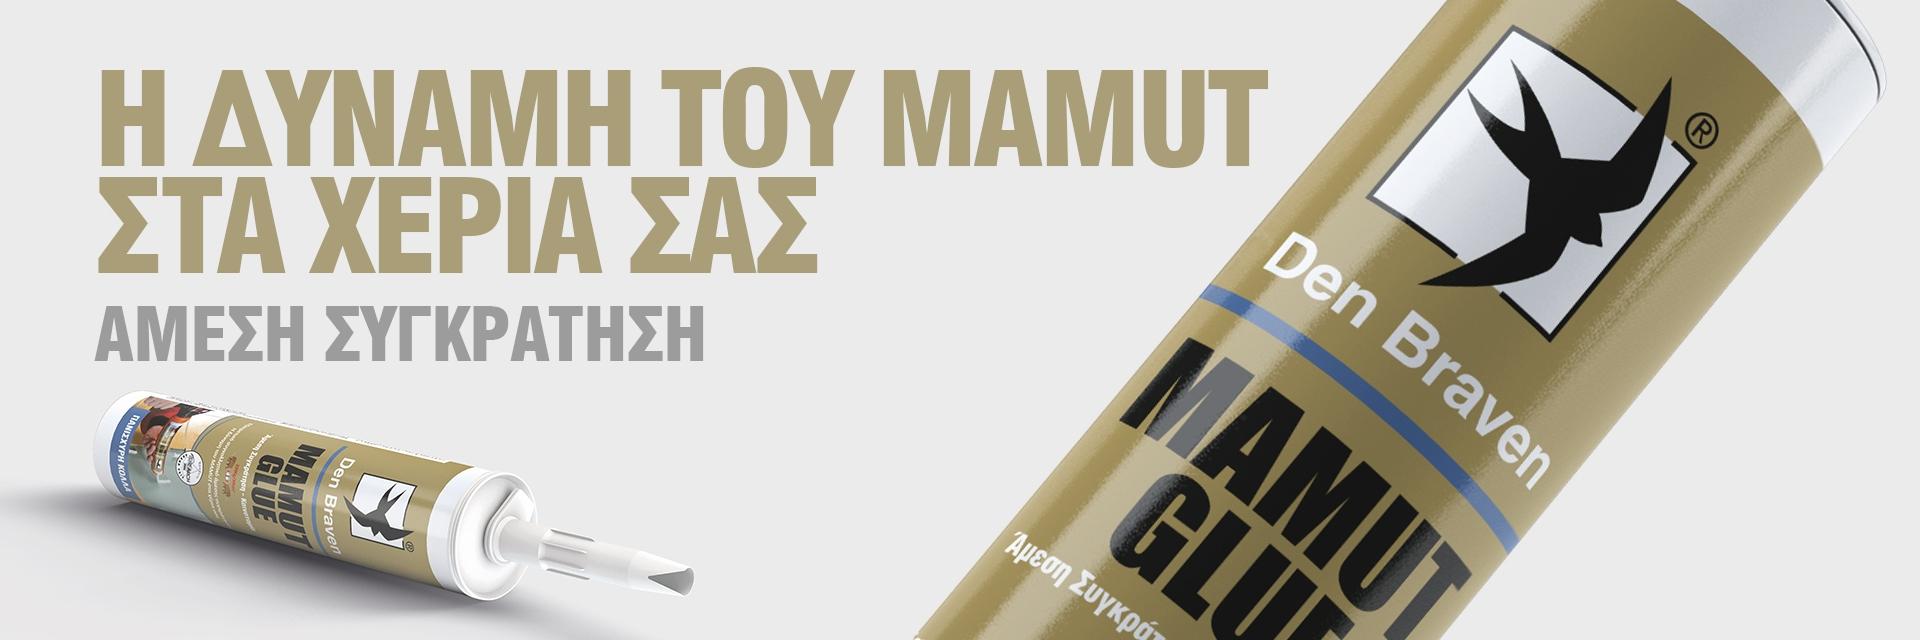 Bostik DIY Greece Grab Adhesives Mamut range banner 1920x640